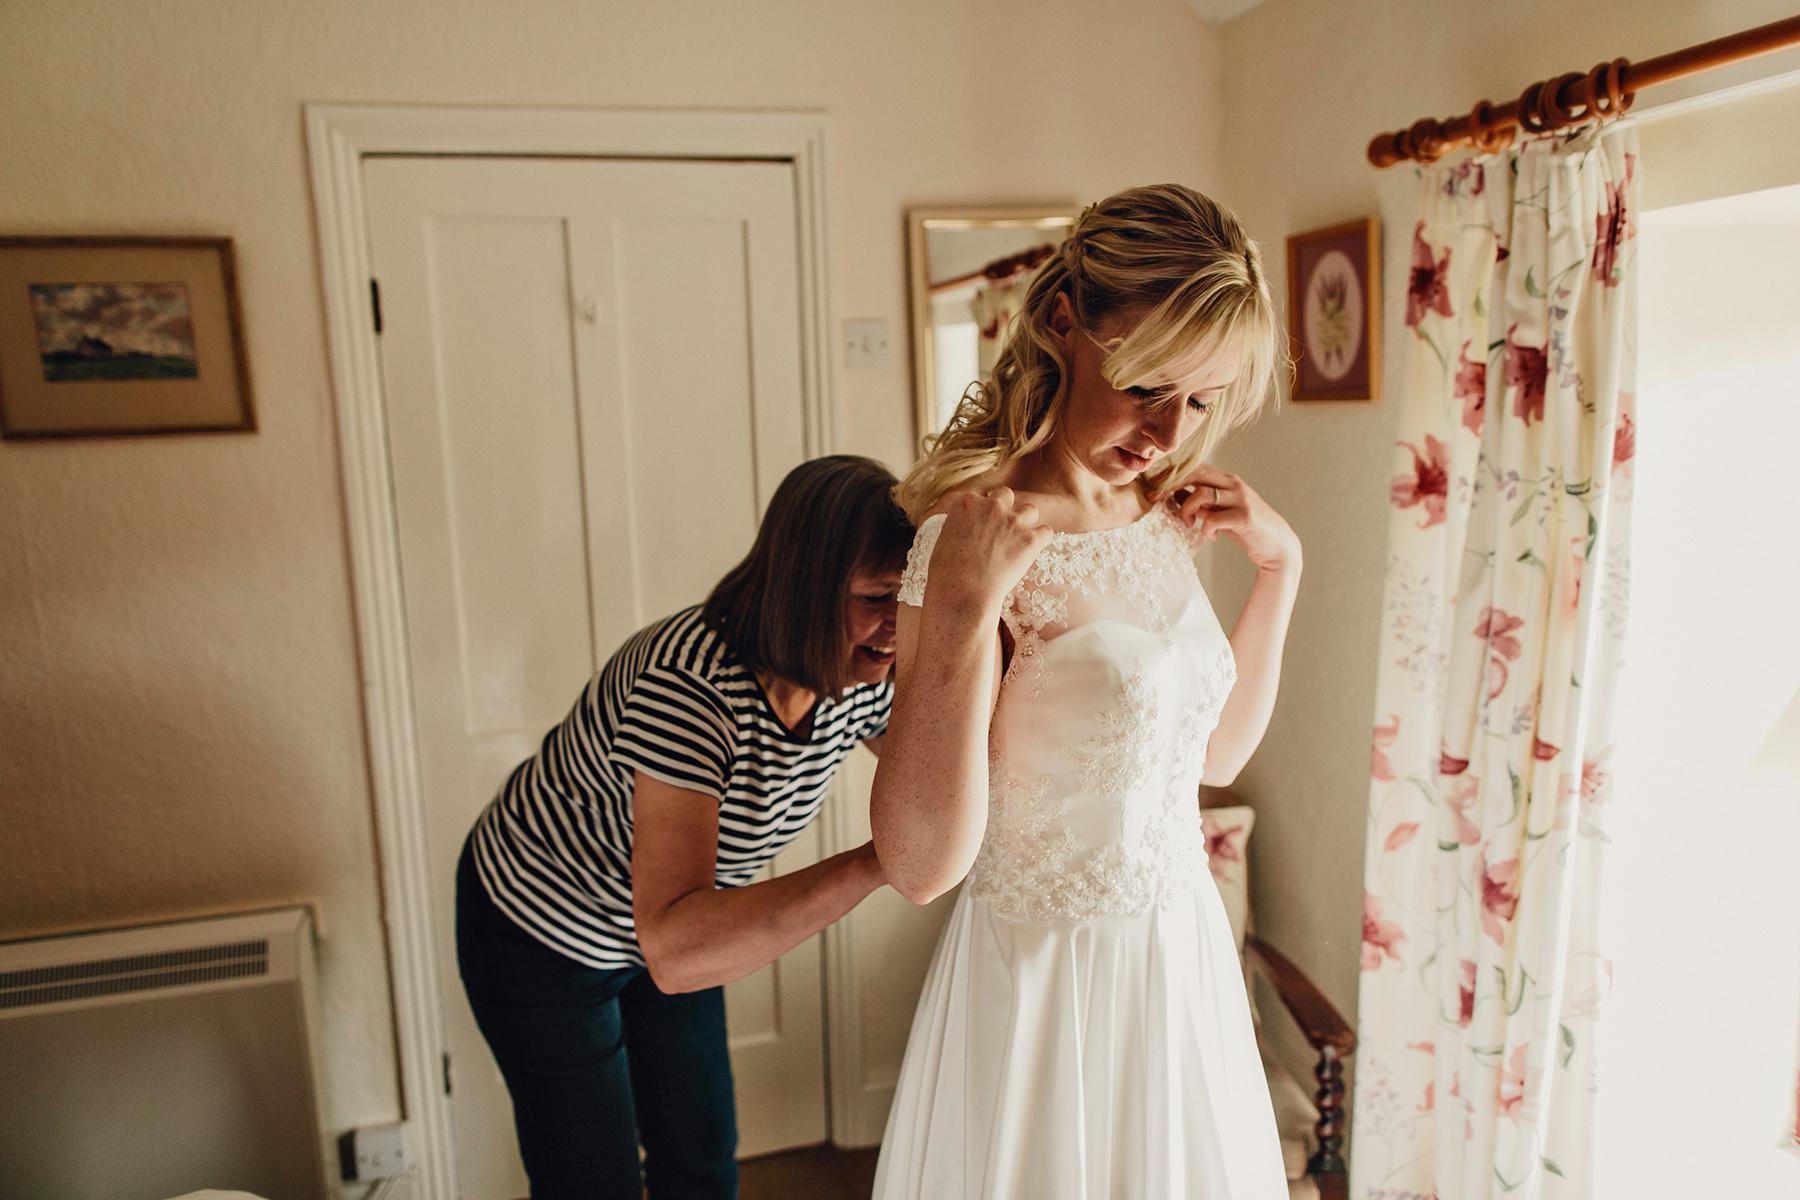 Snowdonia-Wales-Wedding-Photos-0298.jpg